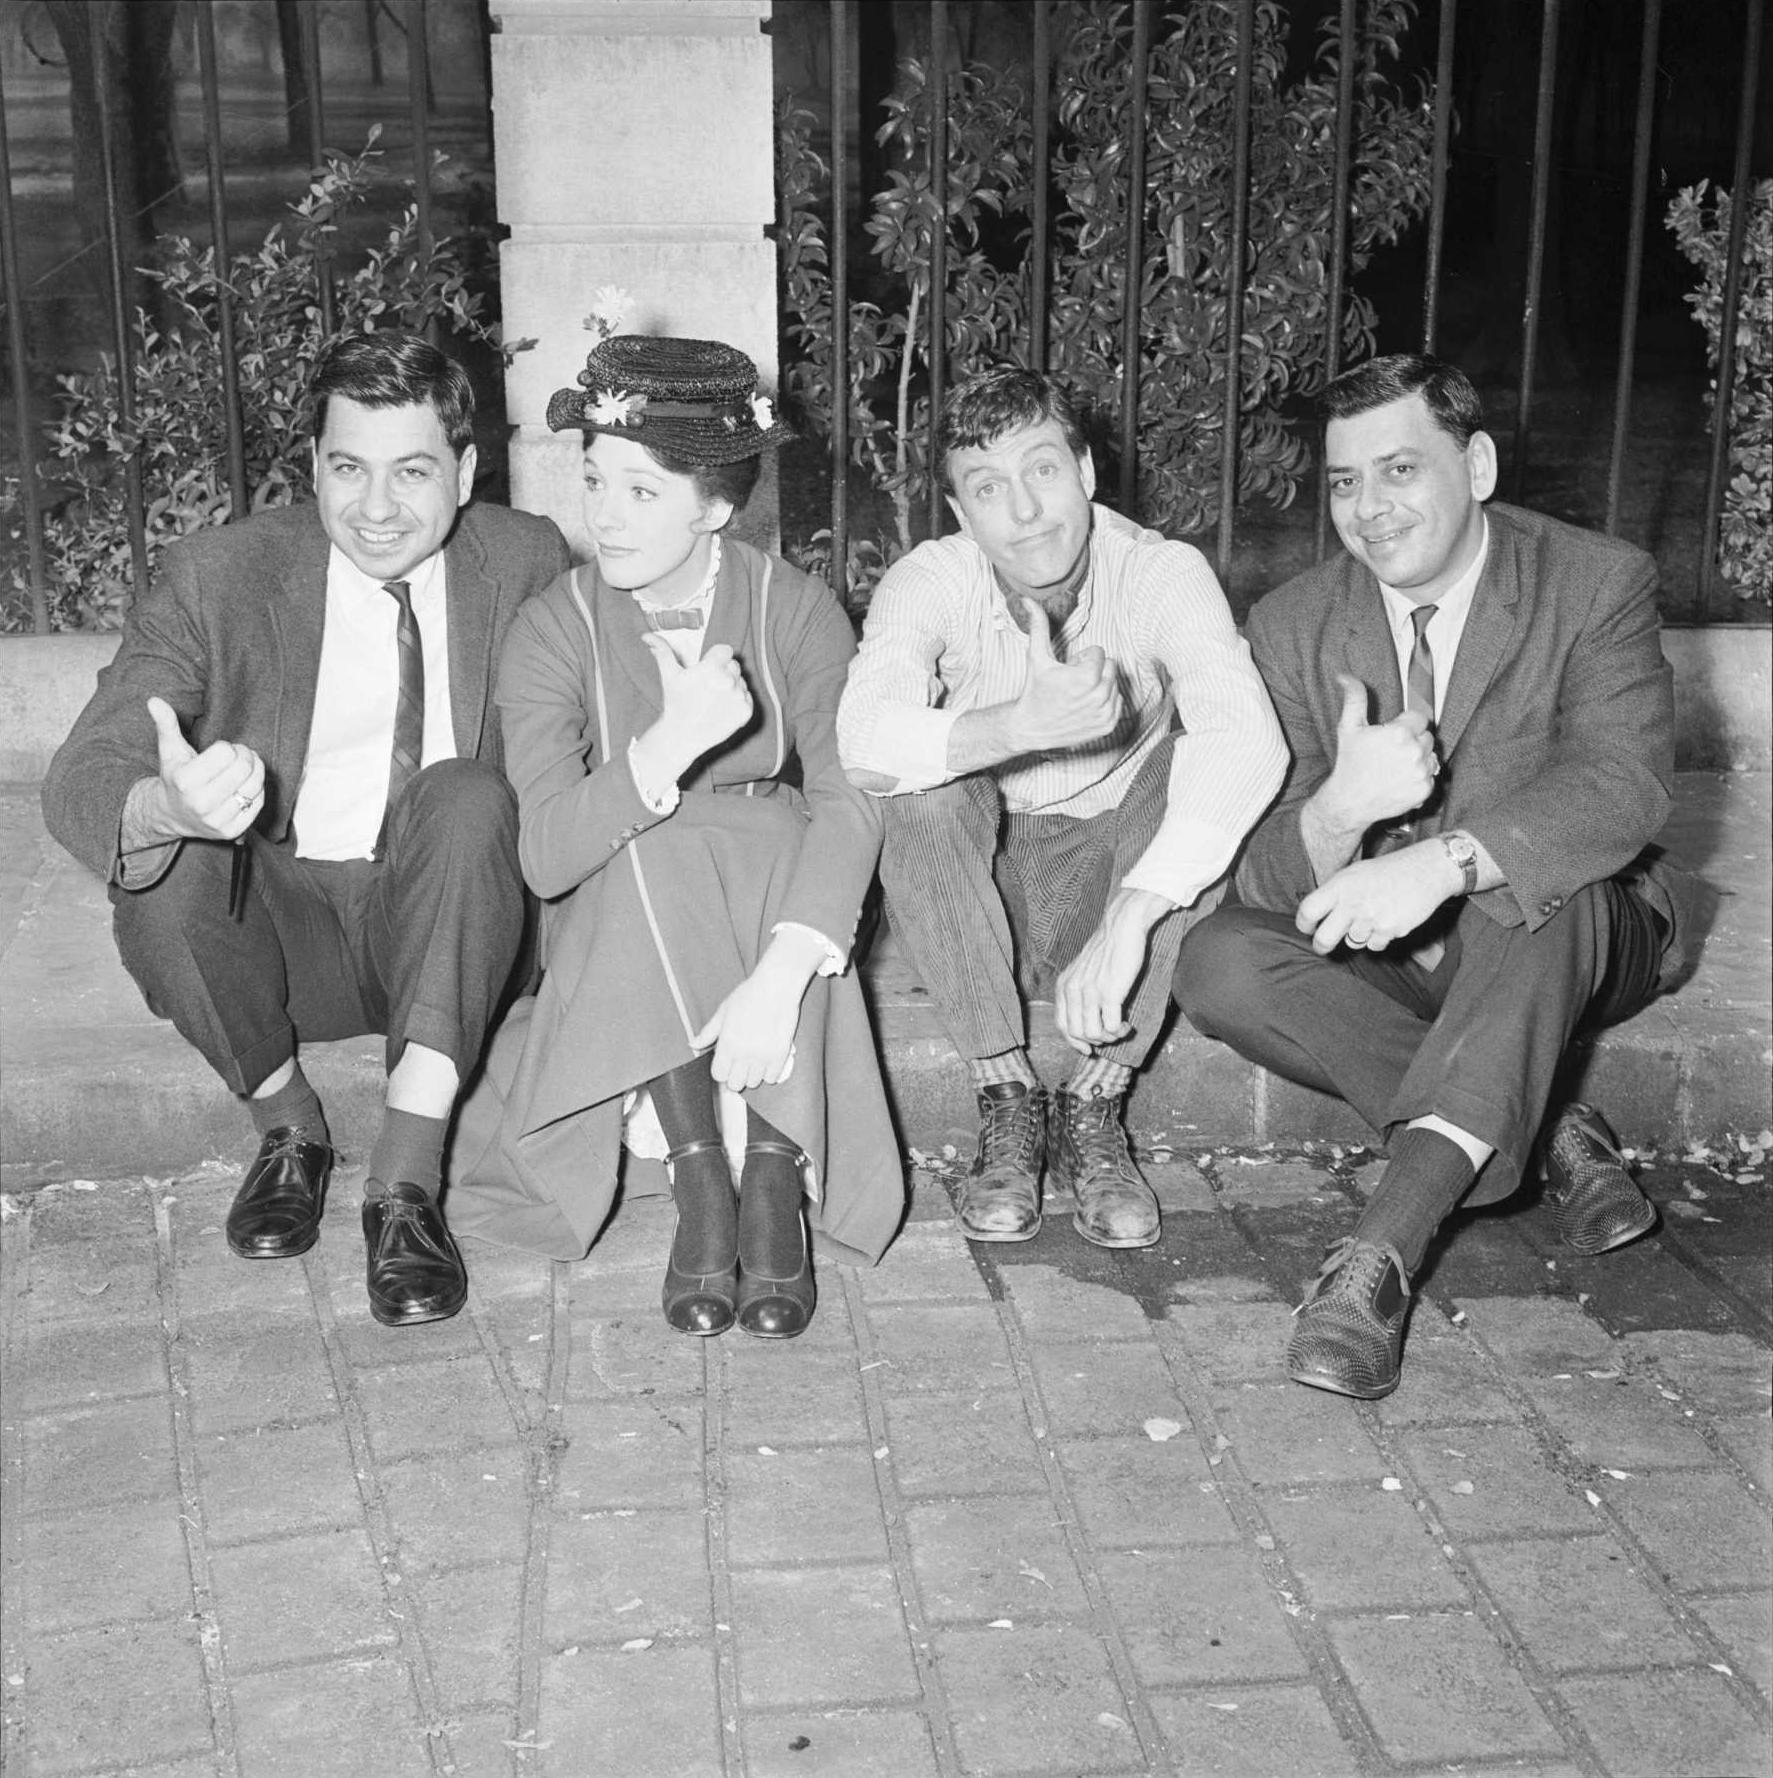 Richard Sherman, Julie Andrews, Dick Van Dyke and Robert Sherman on the set of Mary Poppins. http://t.co/3OHaVSQKi6